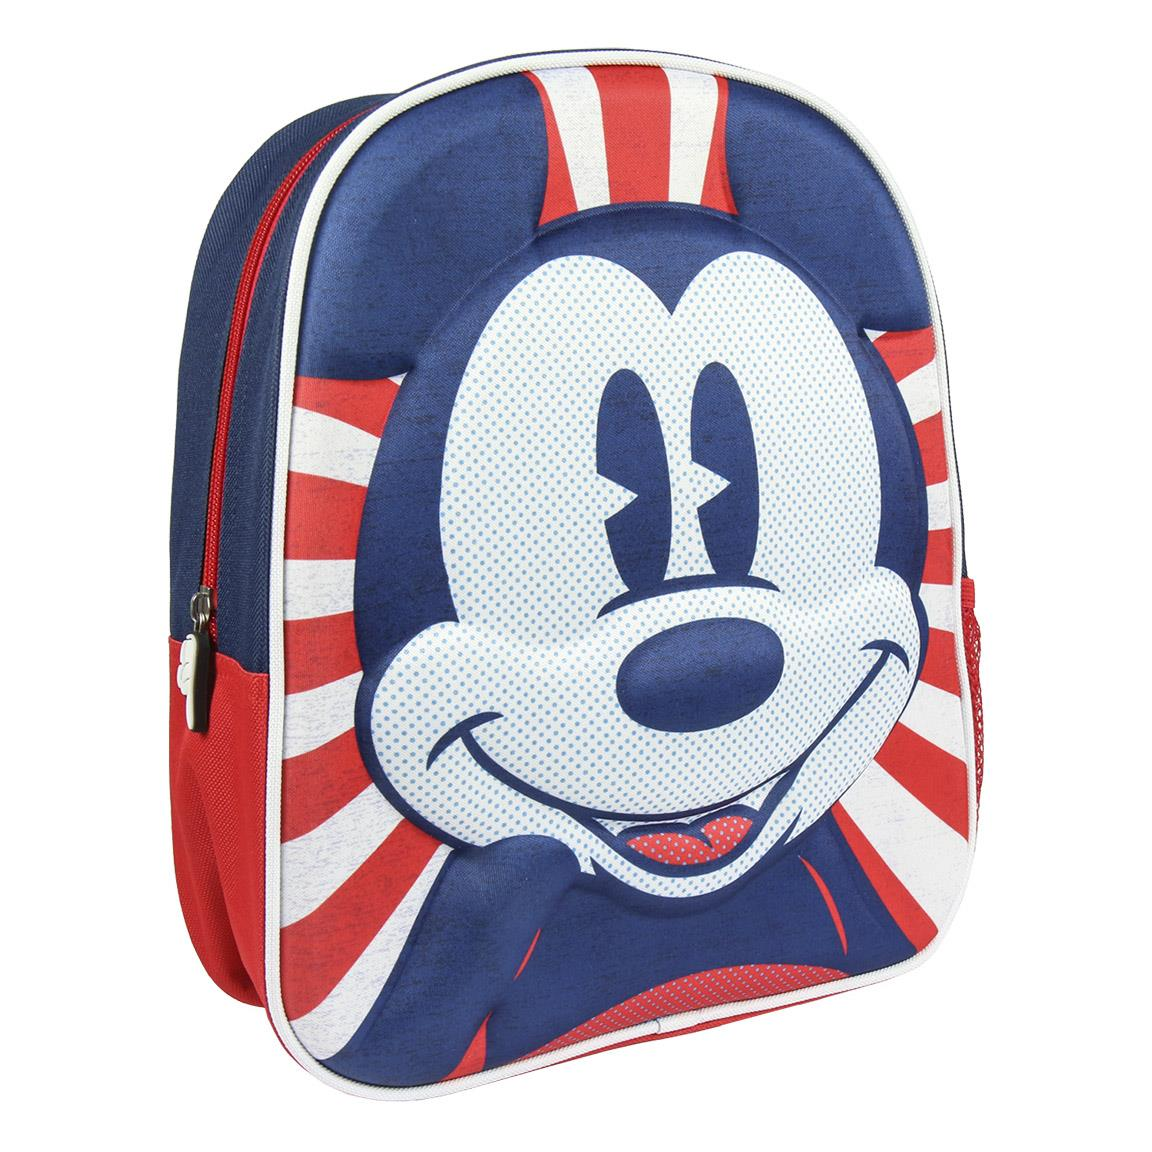 Rucsac cerda mickey mouse 3d, 25x31x10 cm